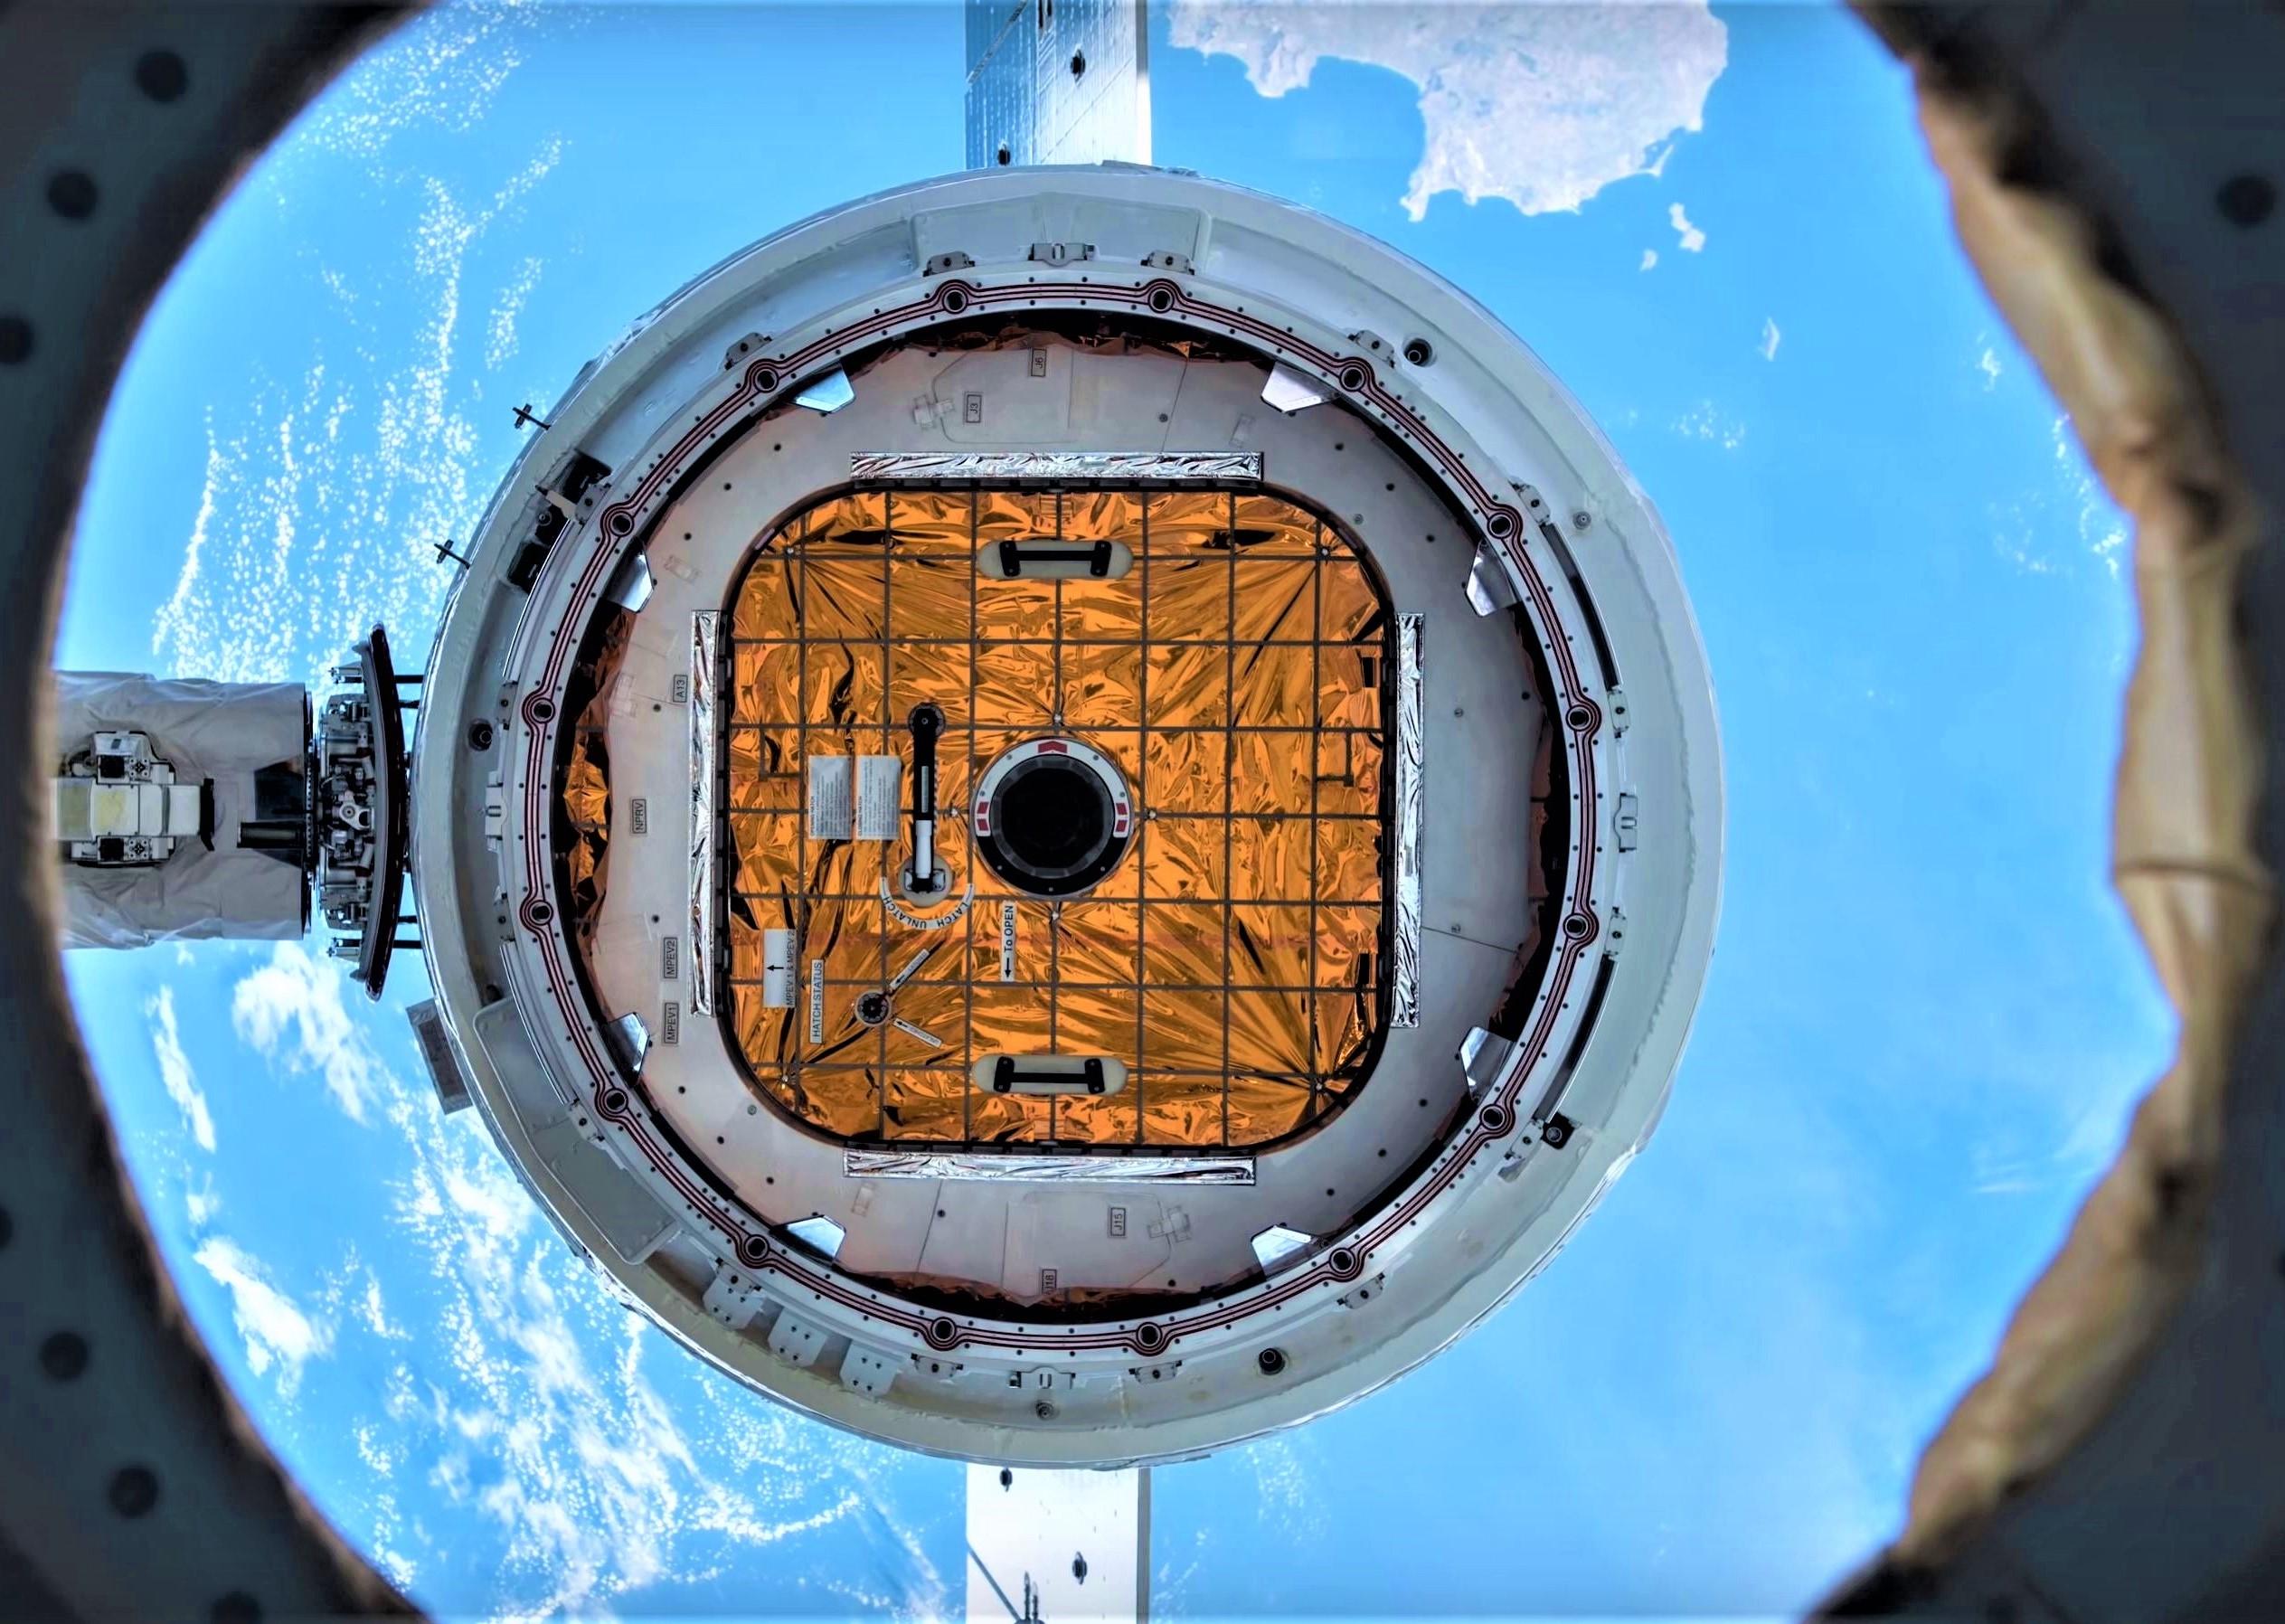 CRS-15 departure 4K (ESA) 3